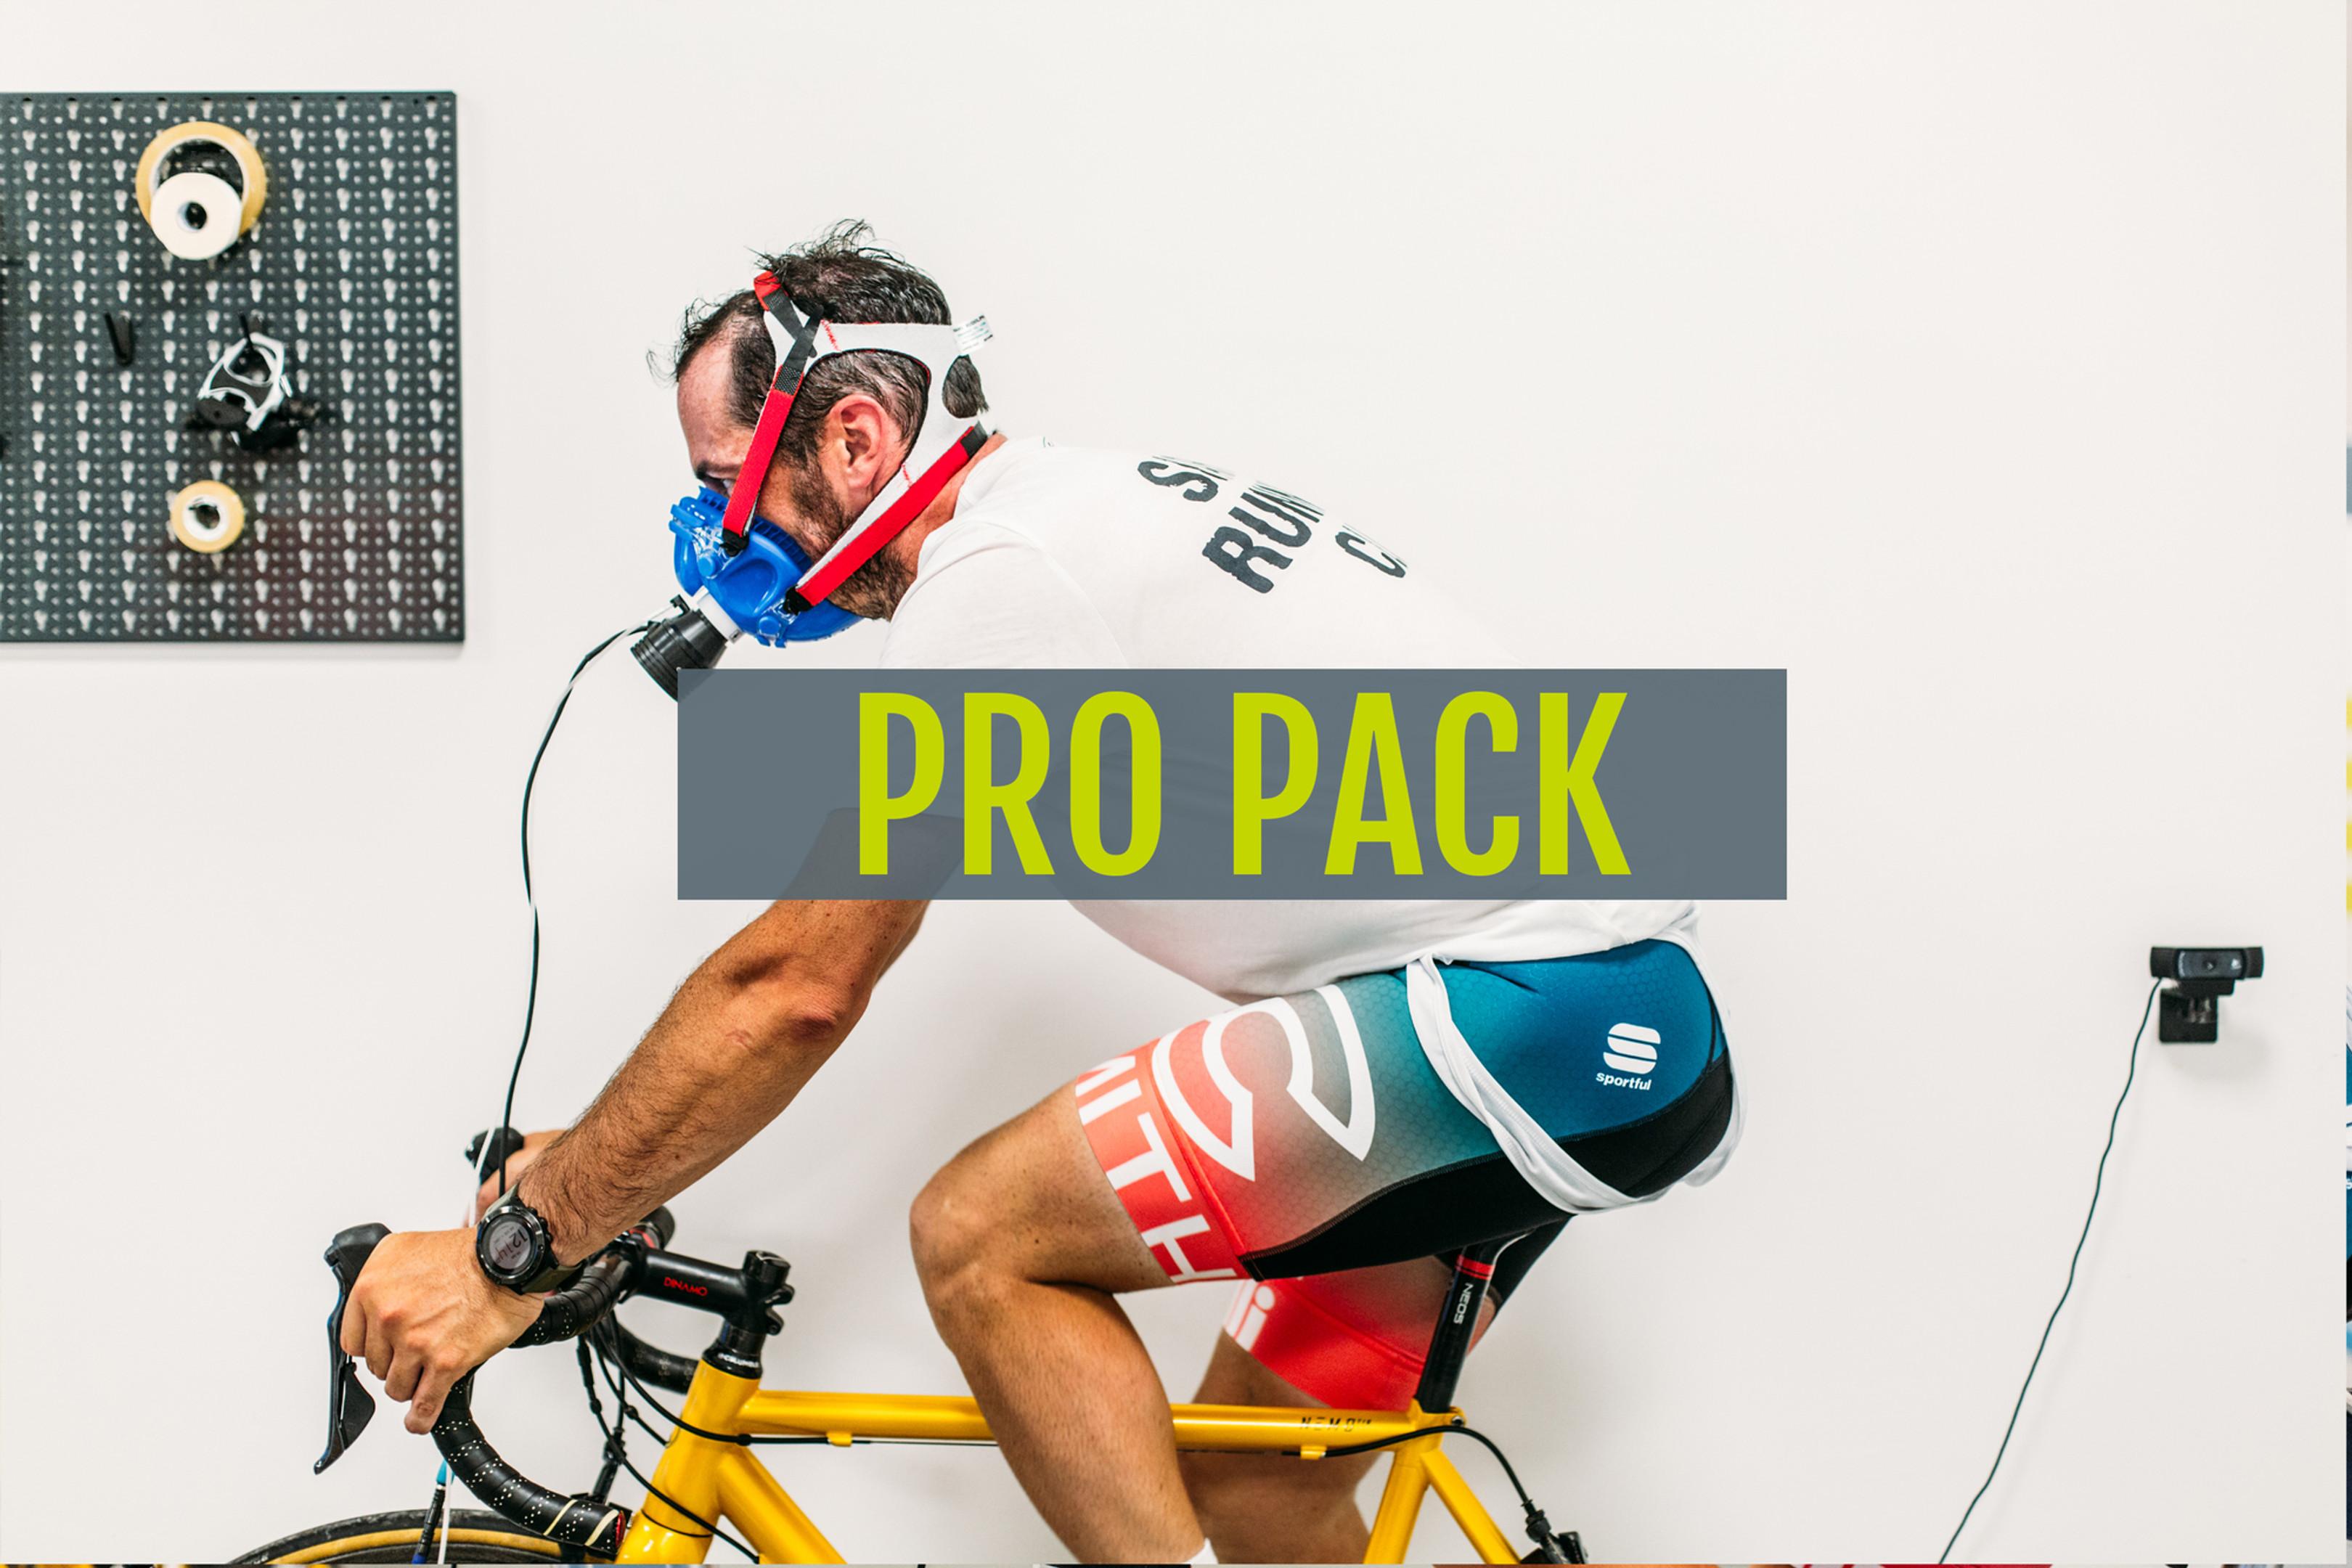 Triathlon - Pro Pack